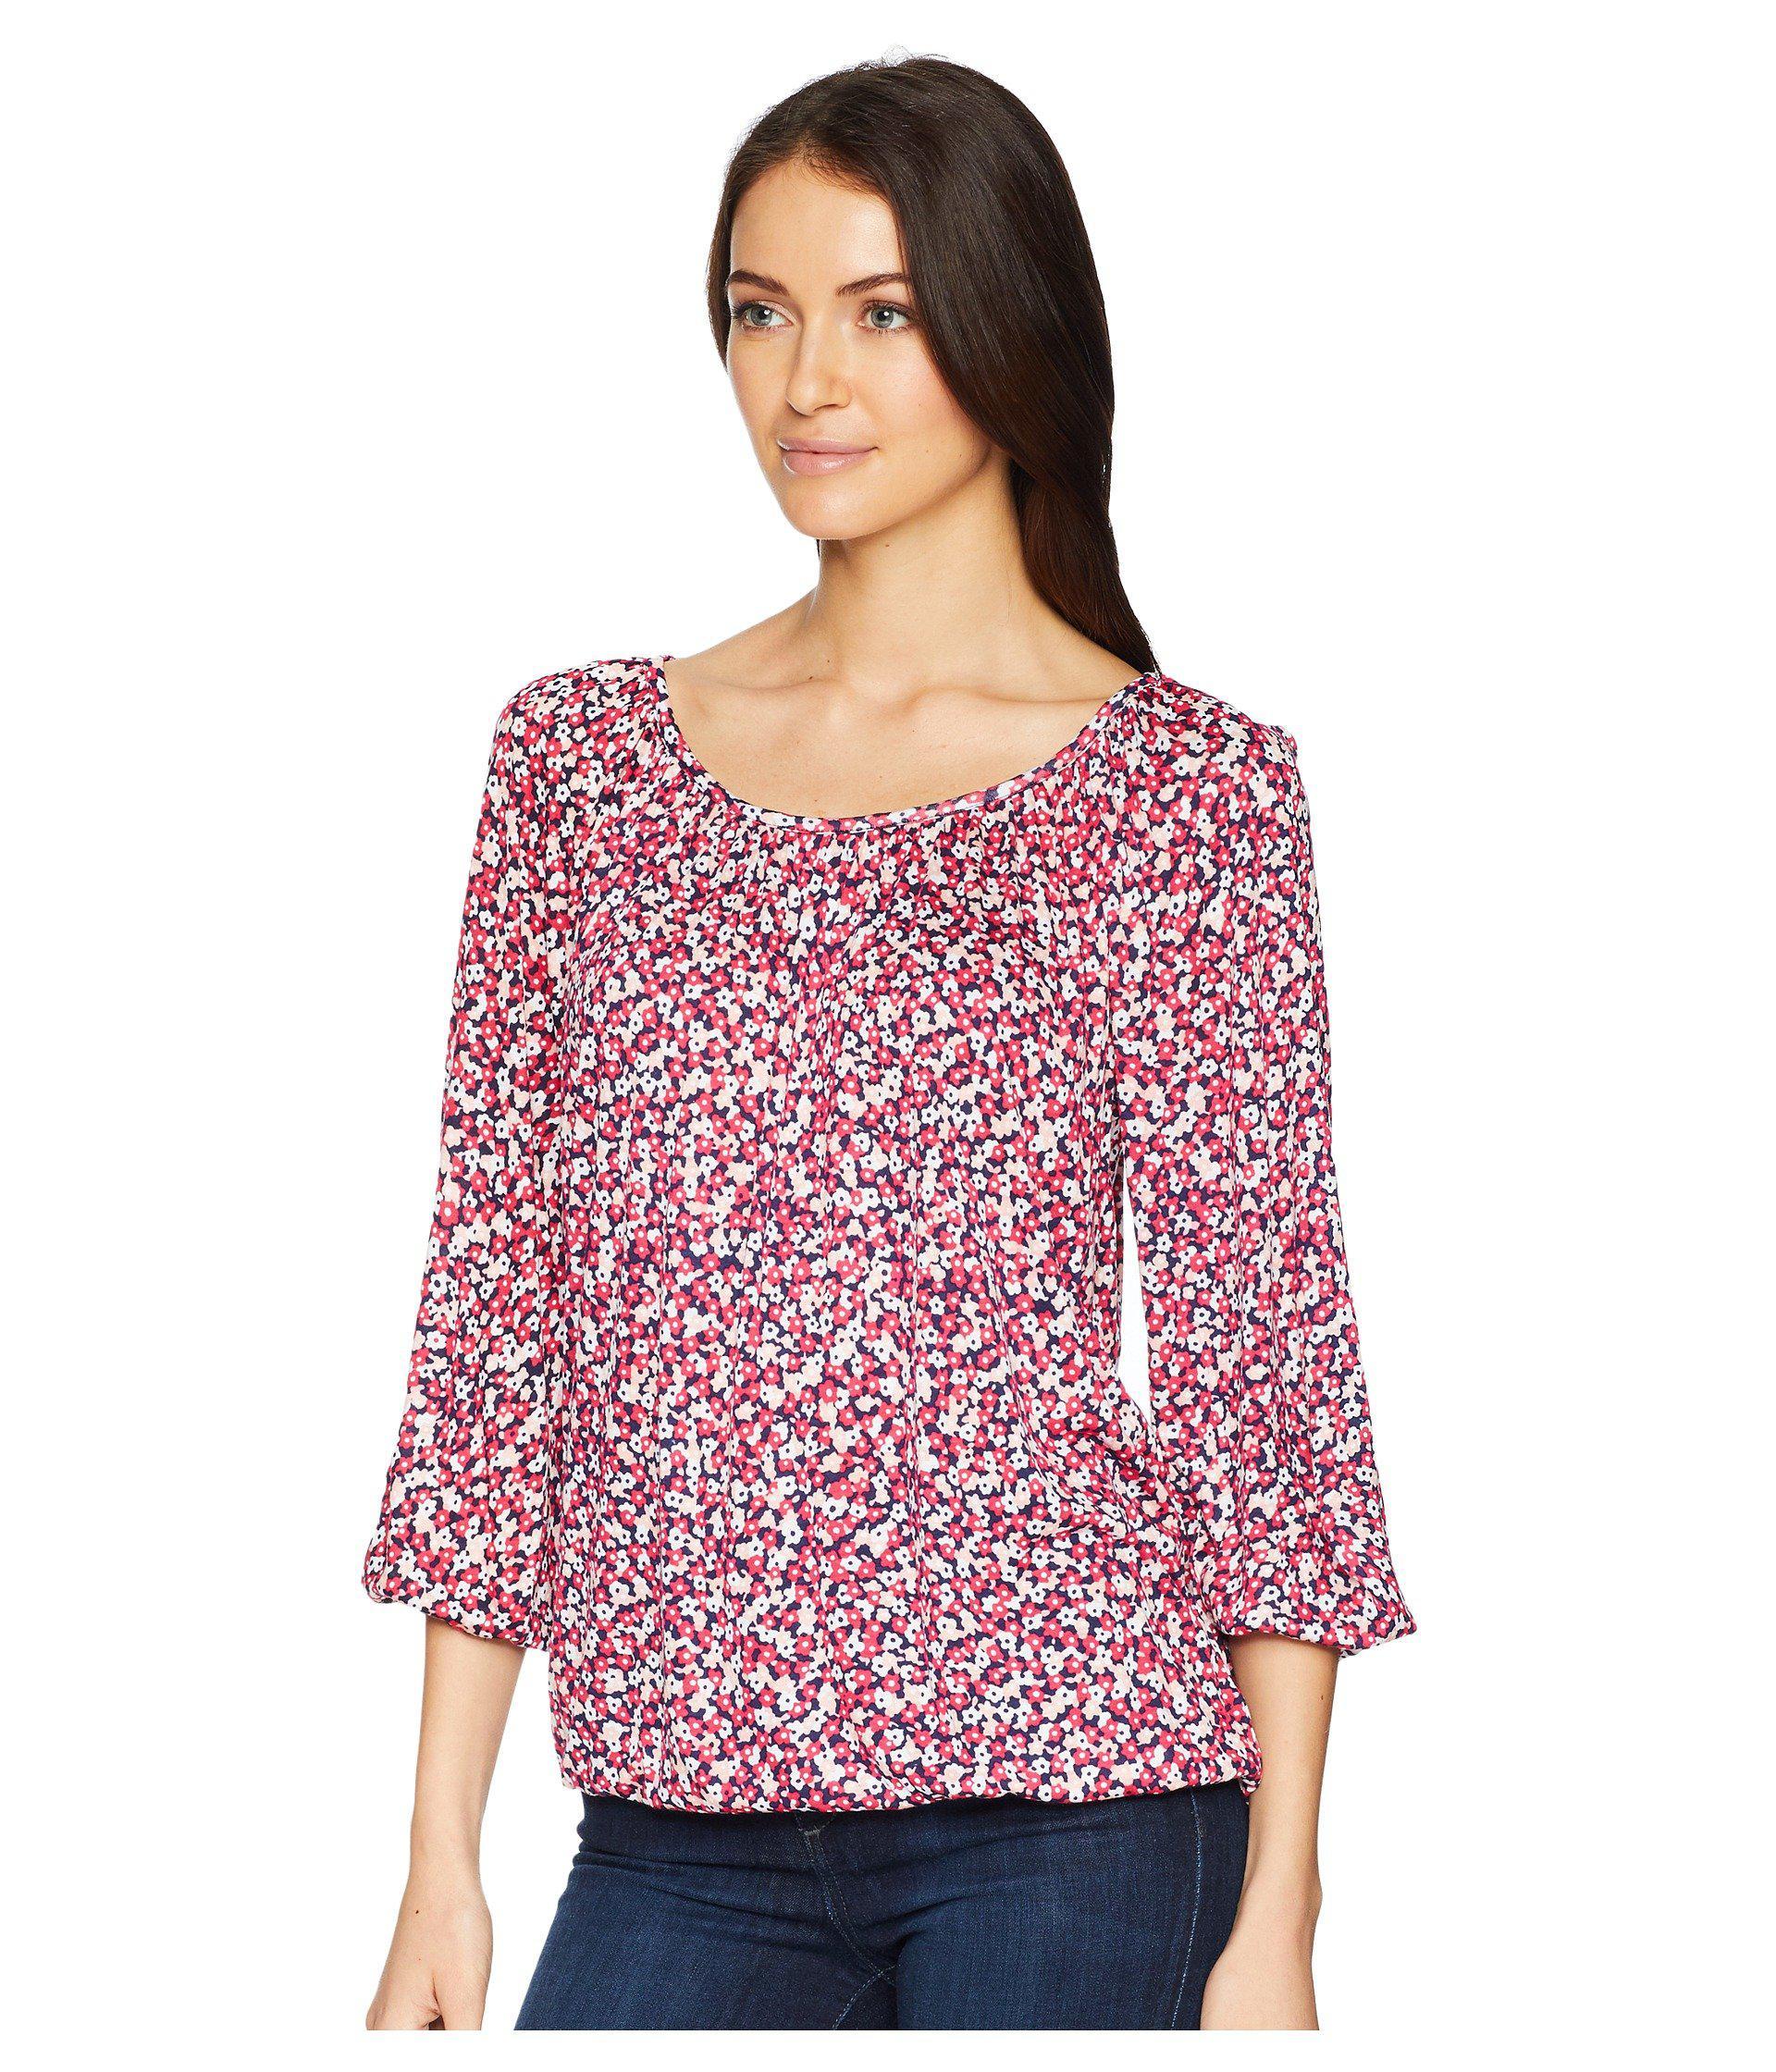 20bcdafa3971c Lyst - MICHAEL Michael Kors Collage Floral Peasant Top in Pink - Save 49%